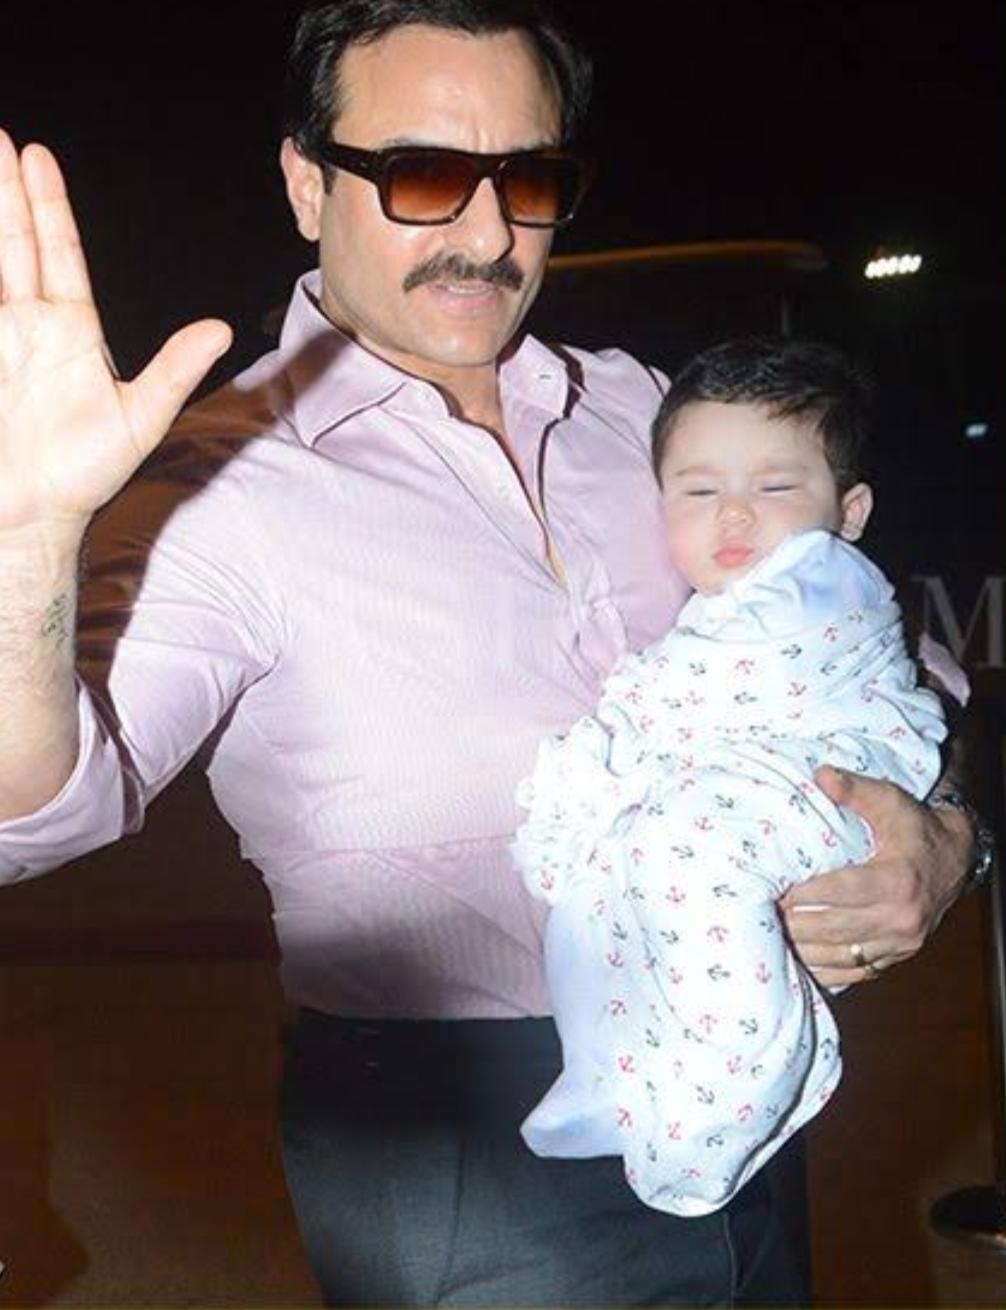 Taimur Ali Khan with Saif Ali Khan at the airport